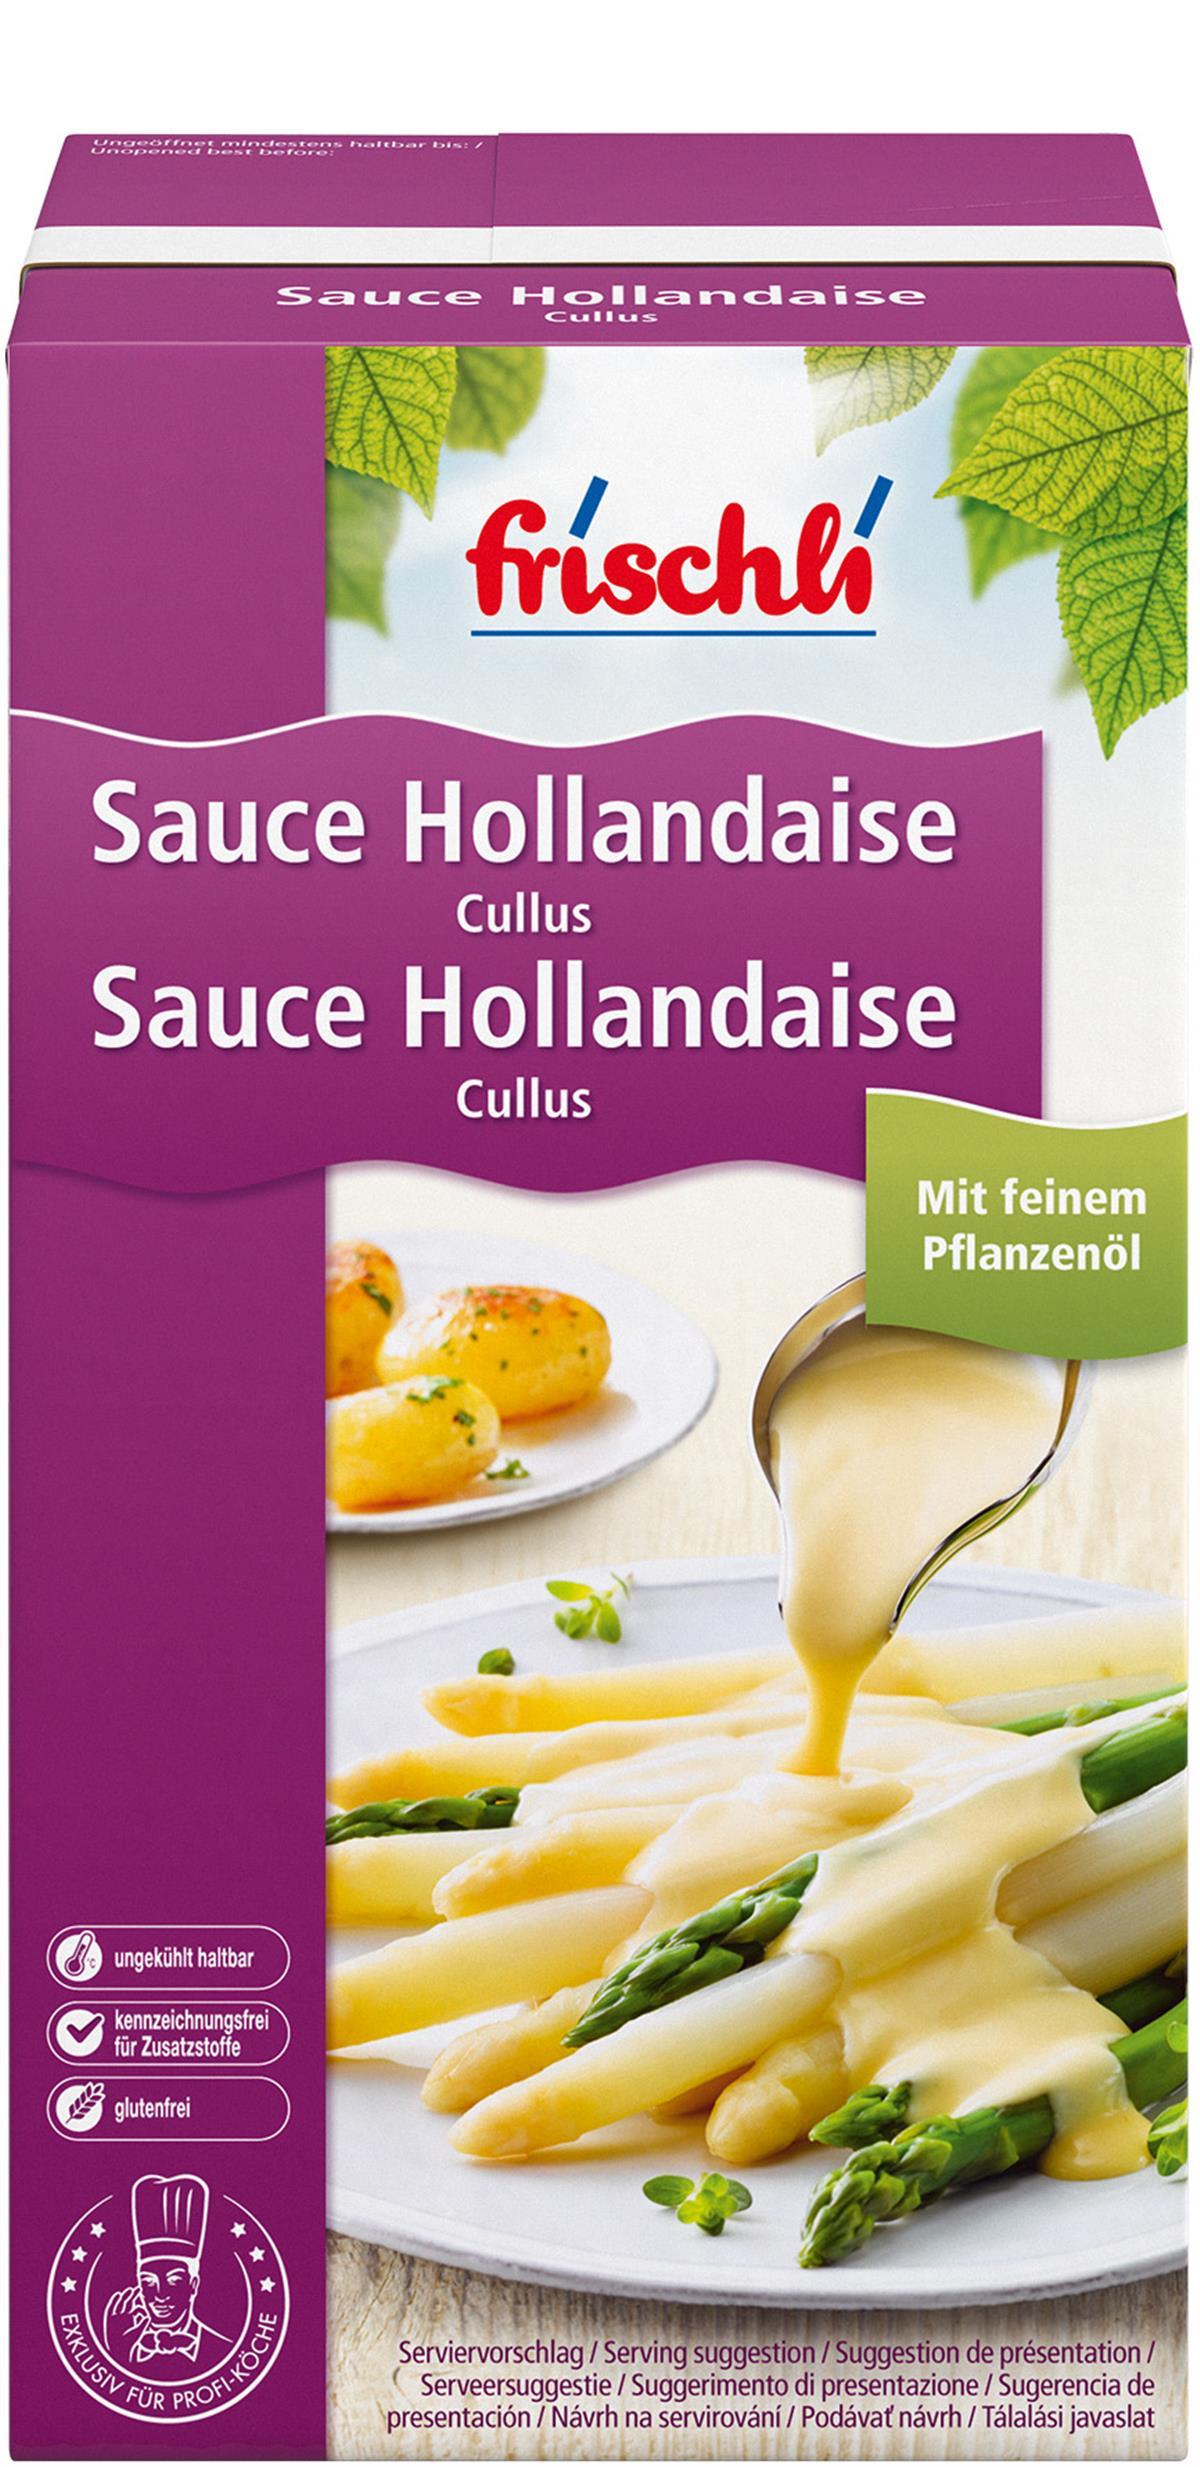 Sauce Hollandaise - Cullus Frischli